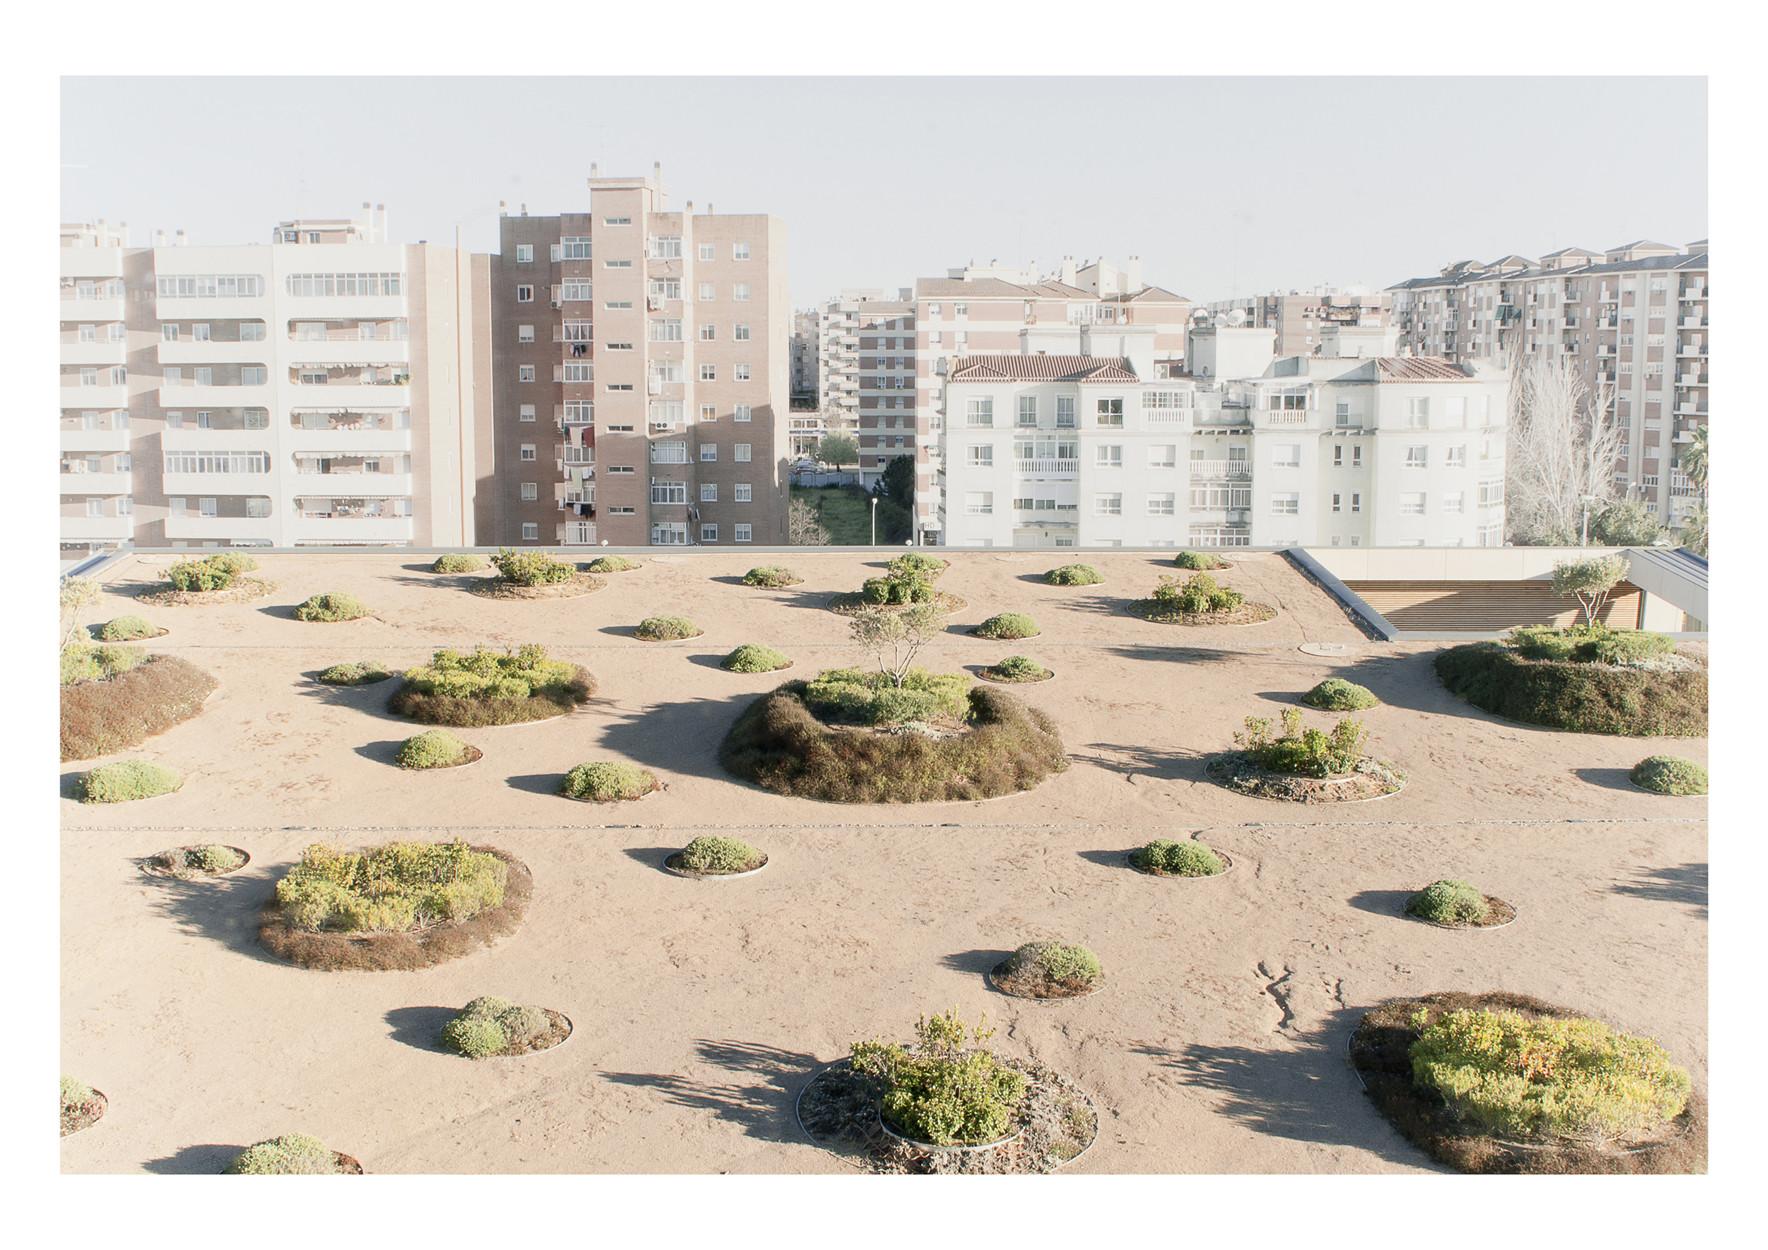 Paisaje y arquitectura parque jardines y cubierta verde for Arquitectura de jardines